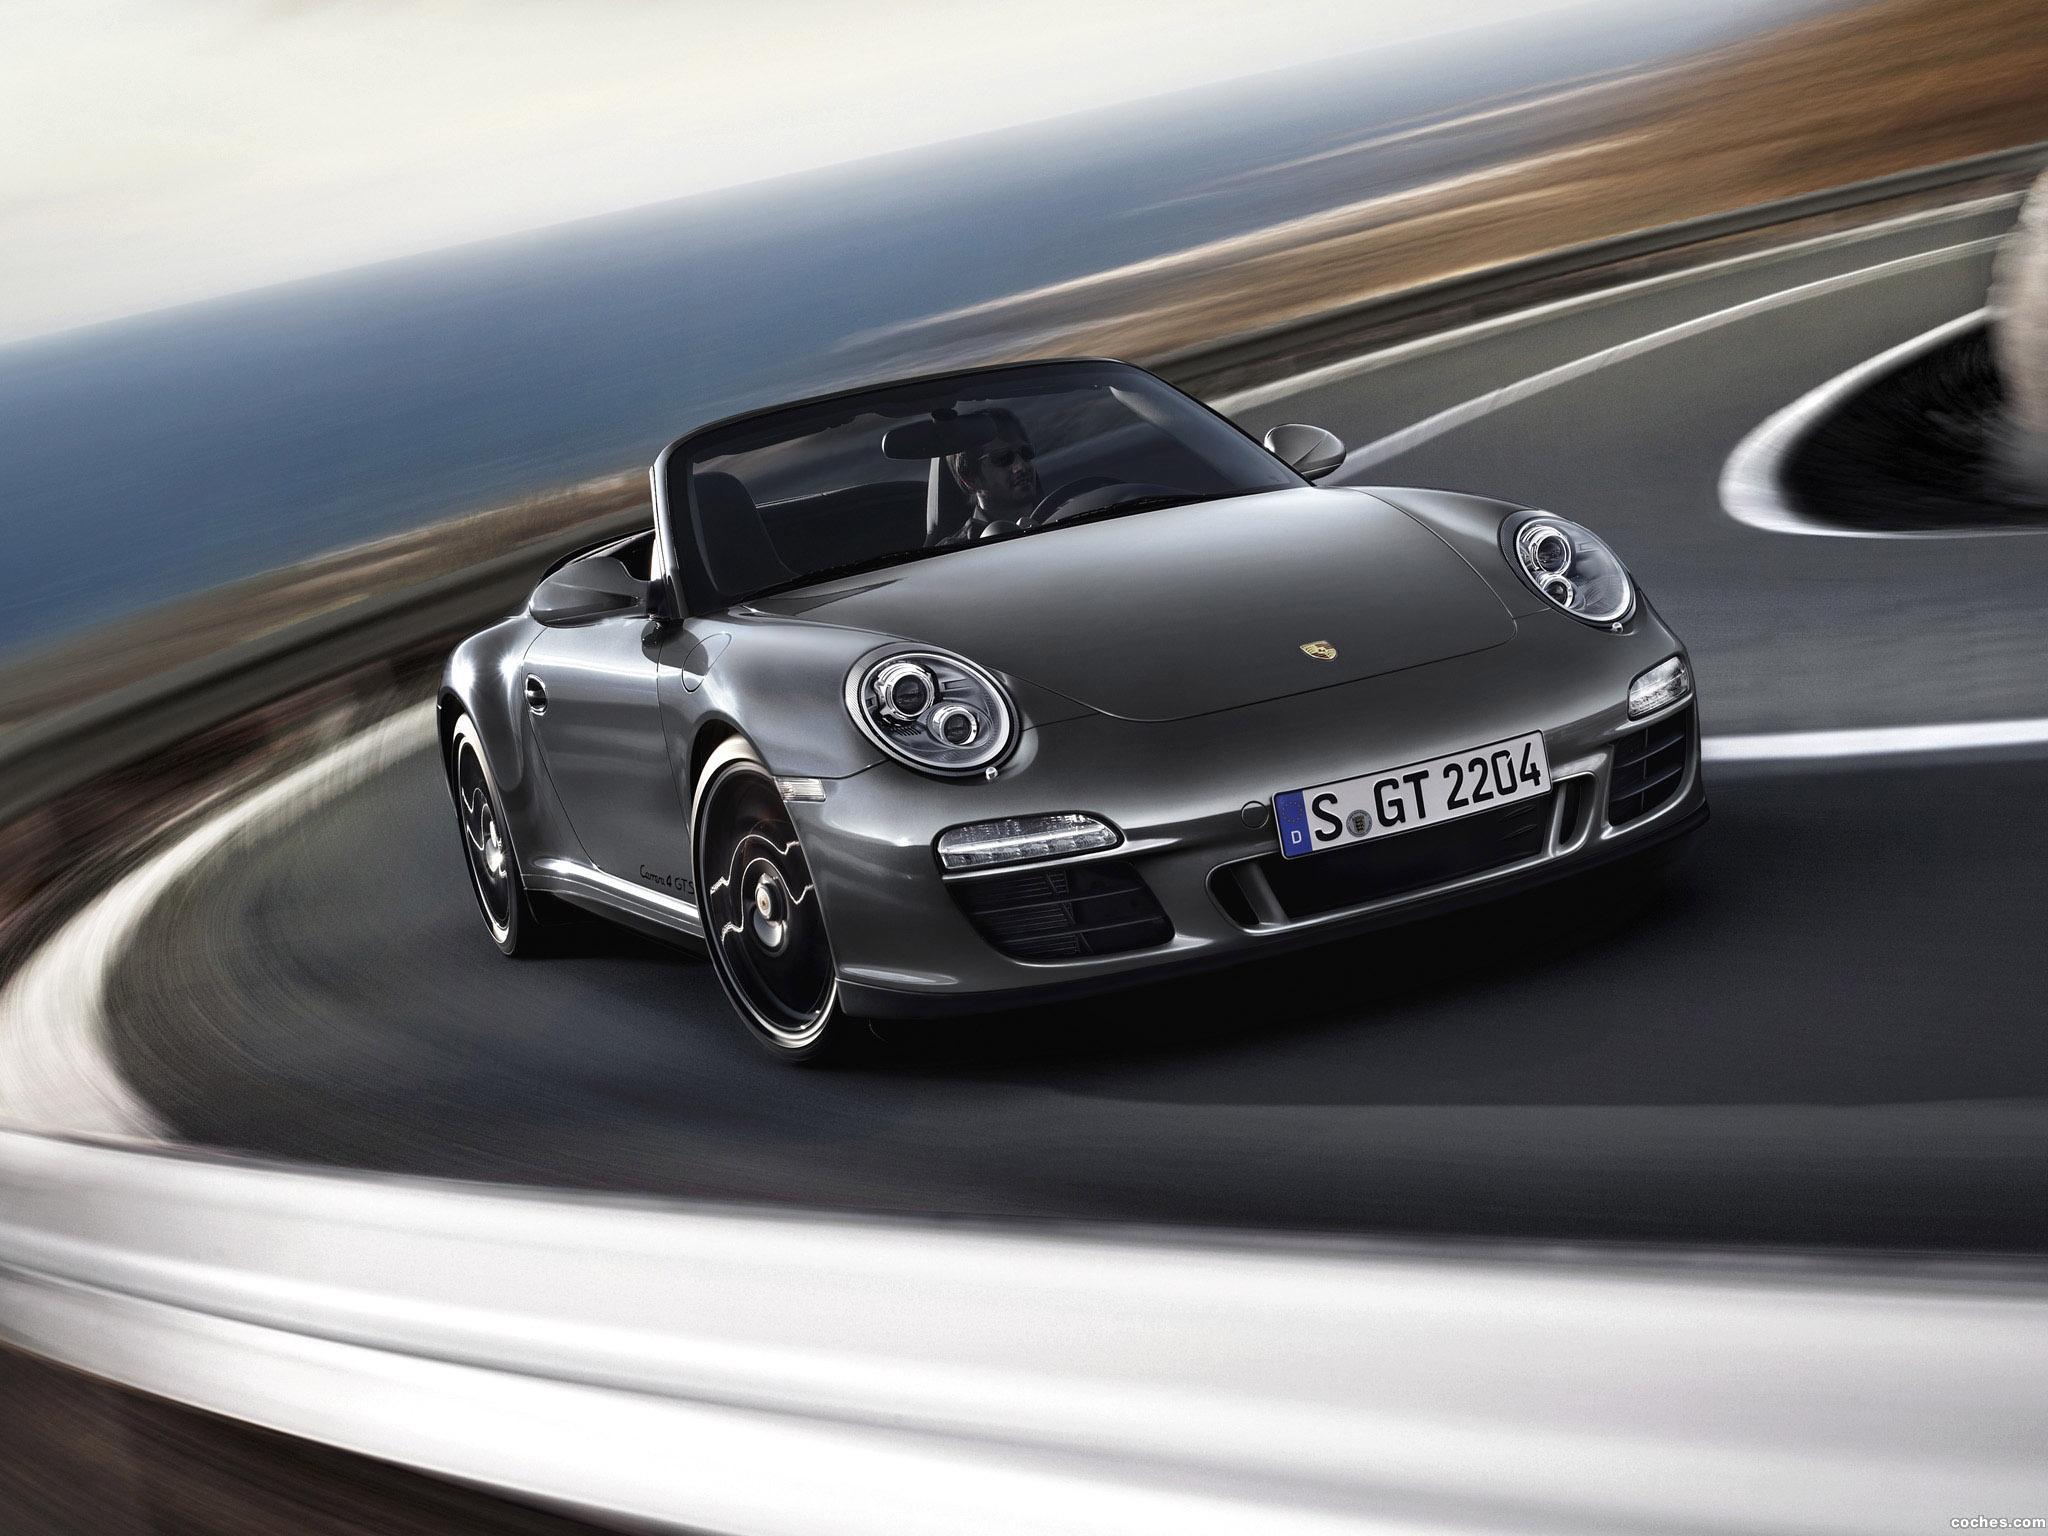 porsche_911-carrera-4-gts-cabriolet-997-2011_r7.jpg